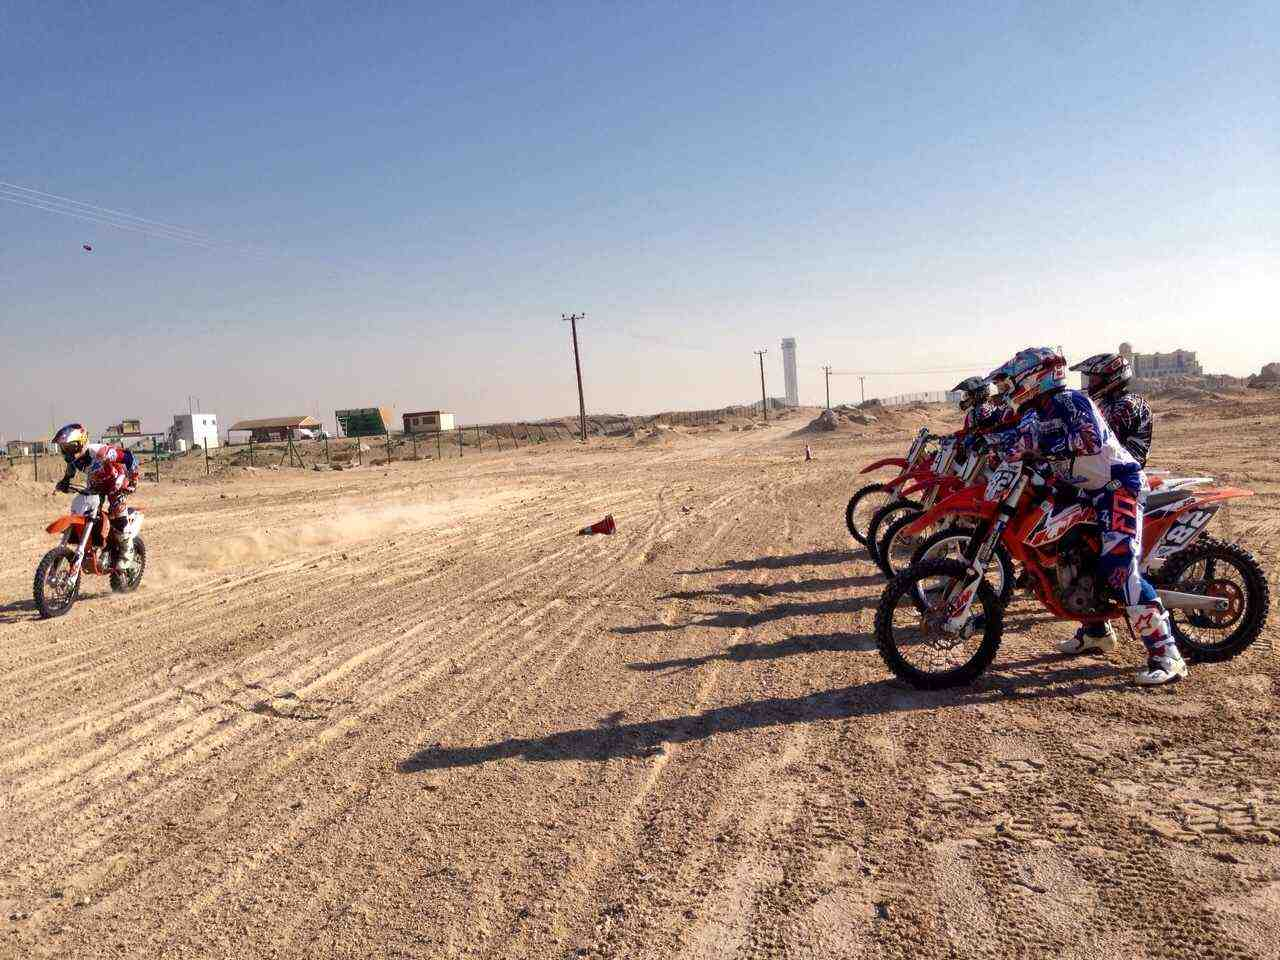 Dirt bike dubai dirt bike riding in dubai dirt bike dubai for all skills levels voltagebd Image collections